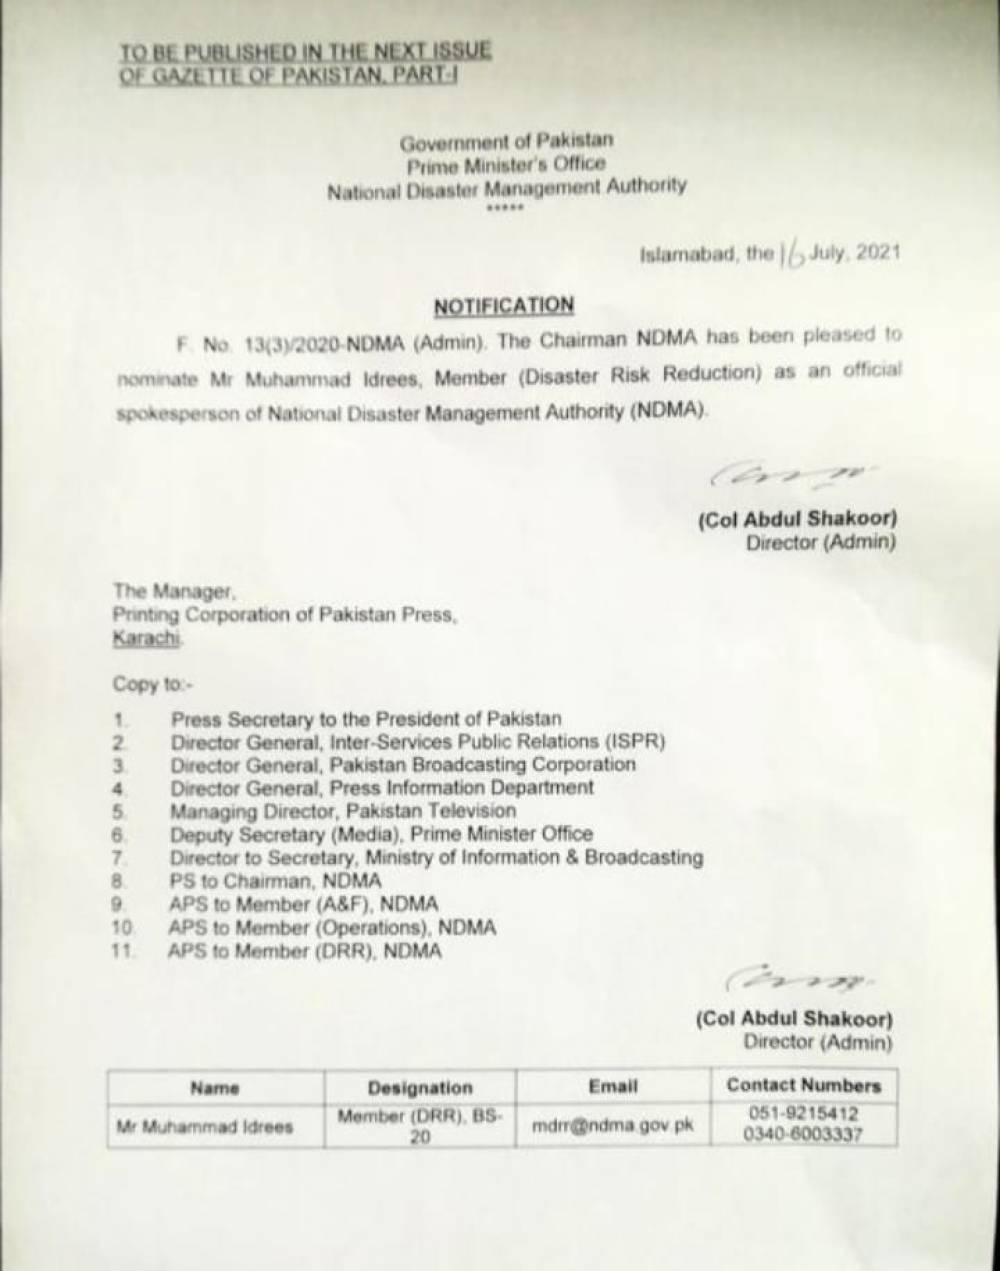 Nomination of Spokesperson of NDMA